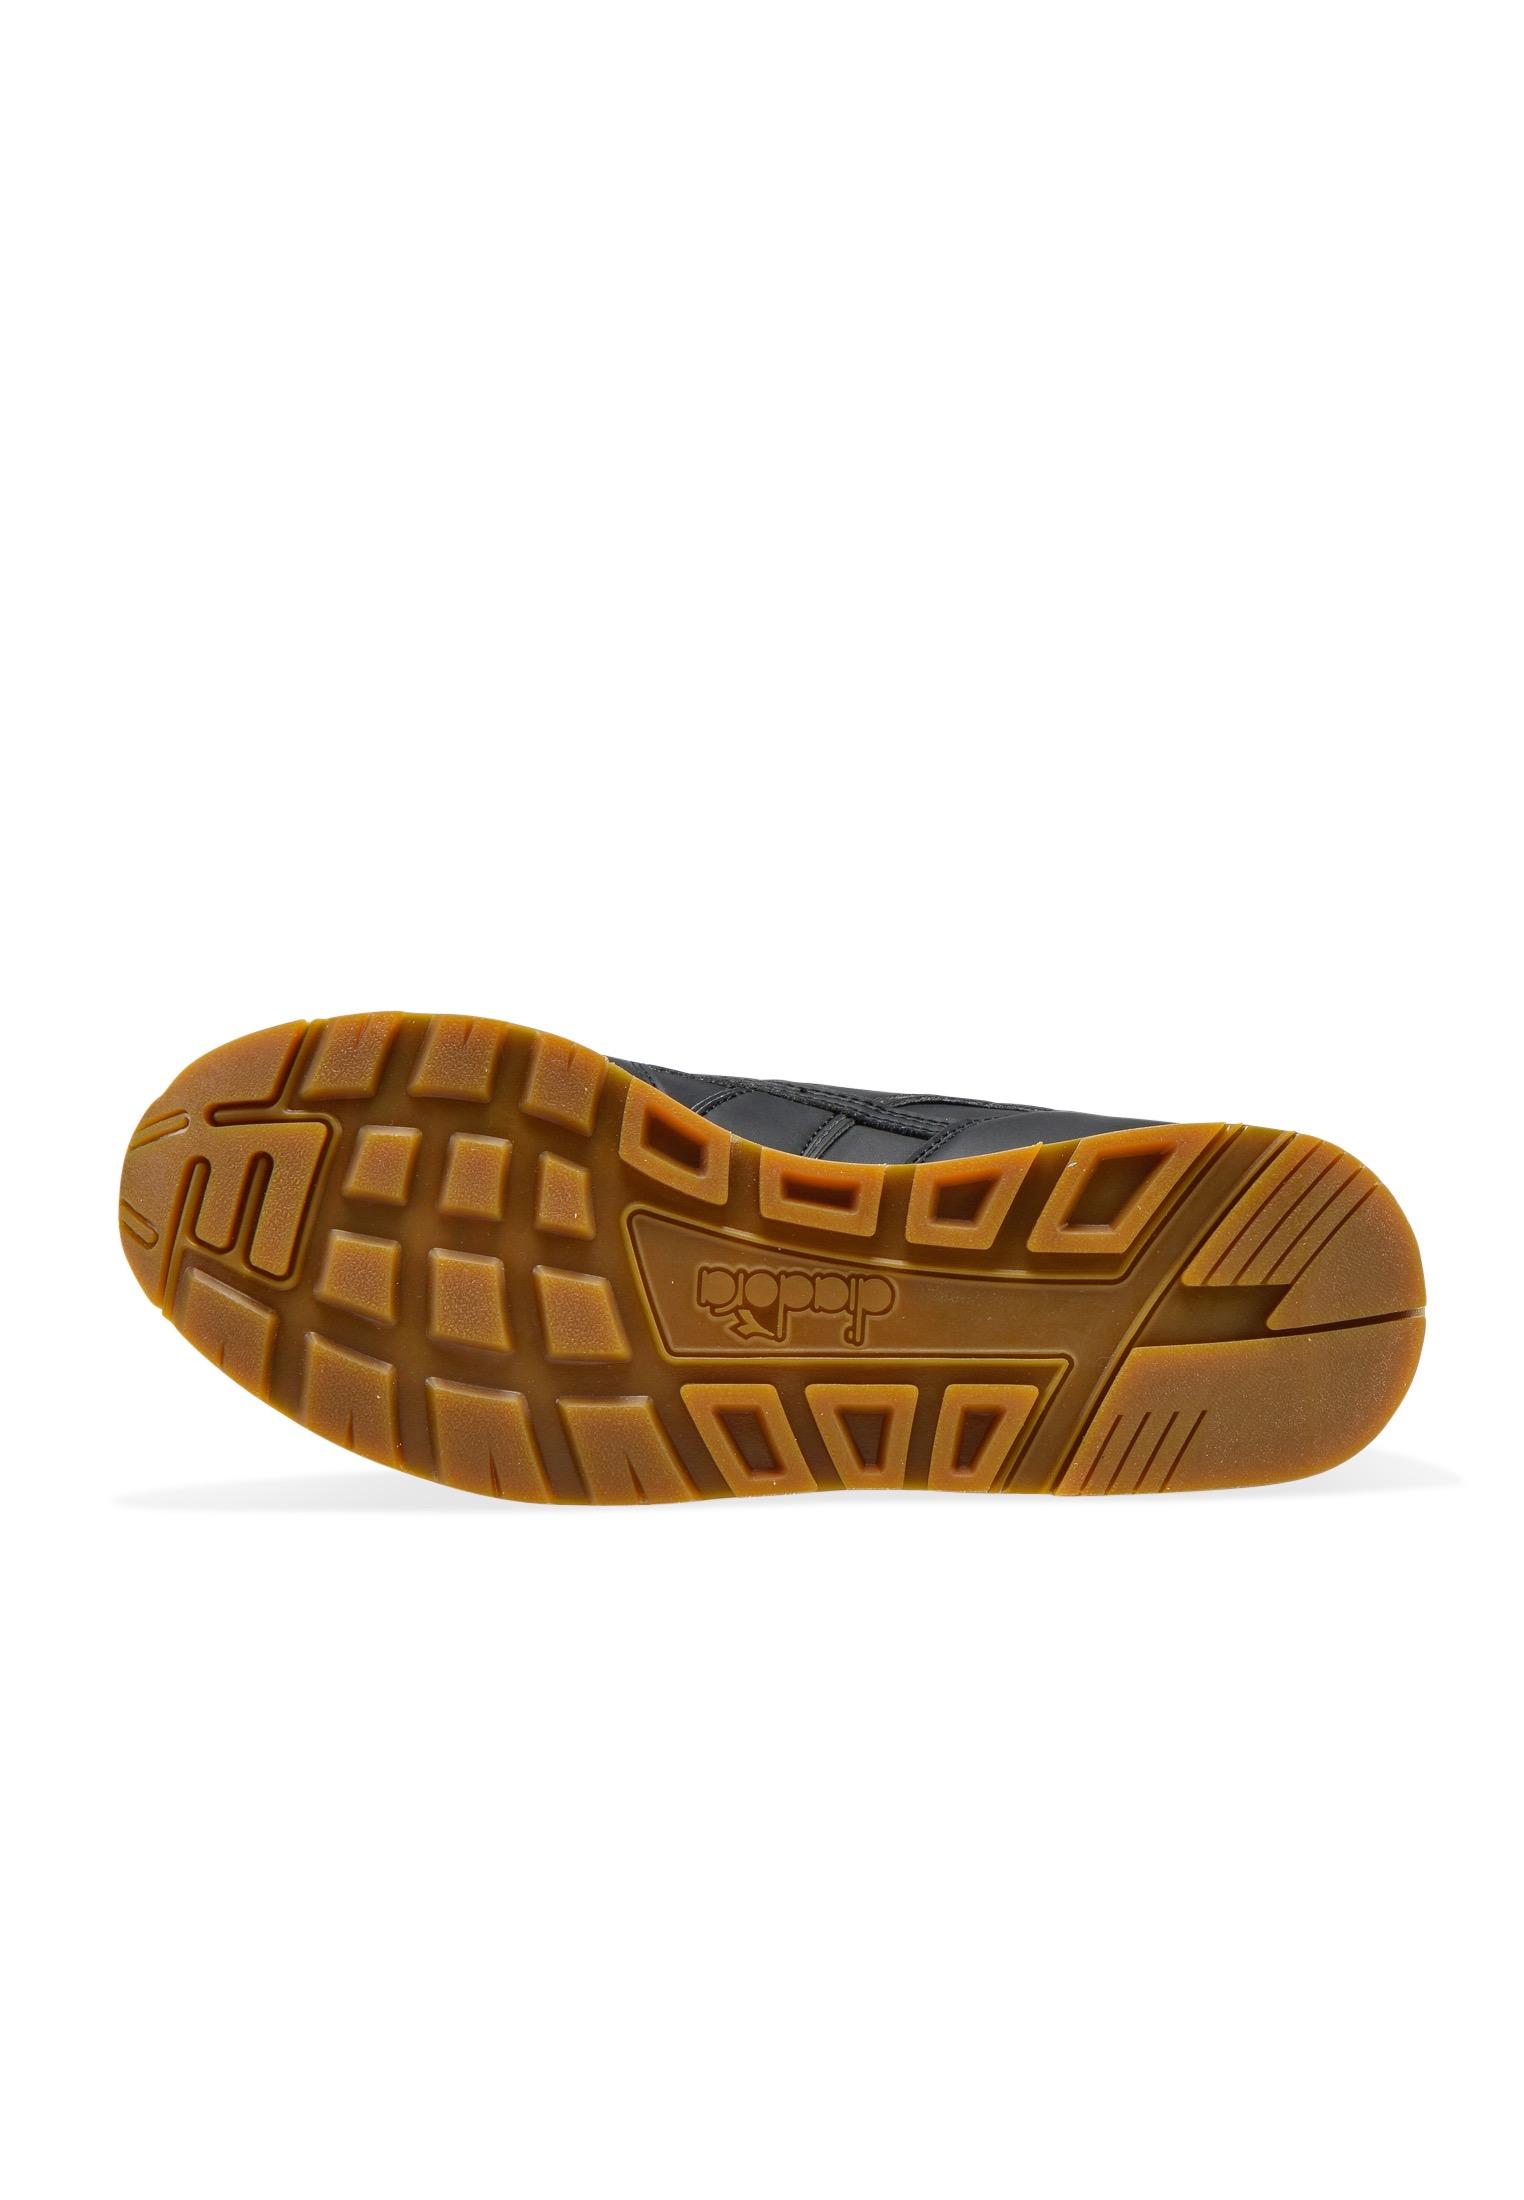 Diadora-Scarpe-Sportive-N-92-L-per-uomo-e-donna miniatura 10